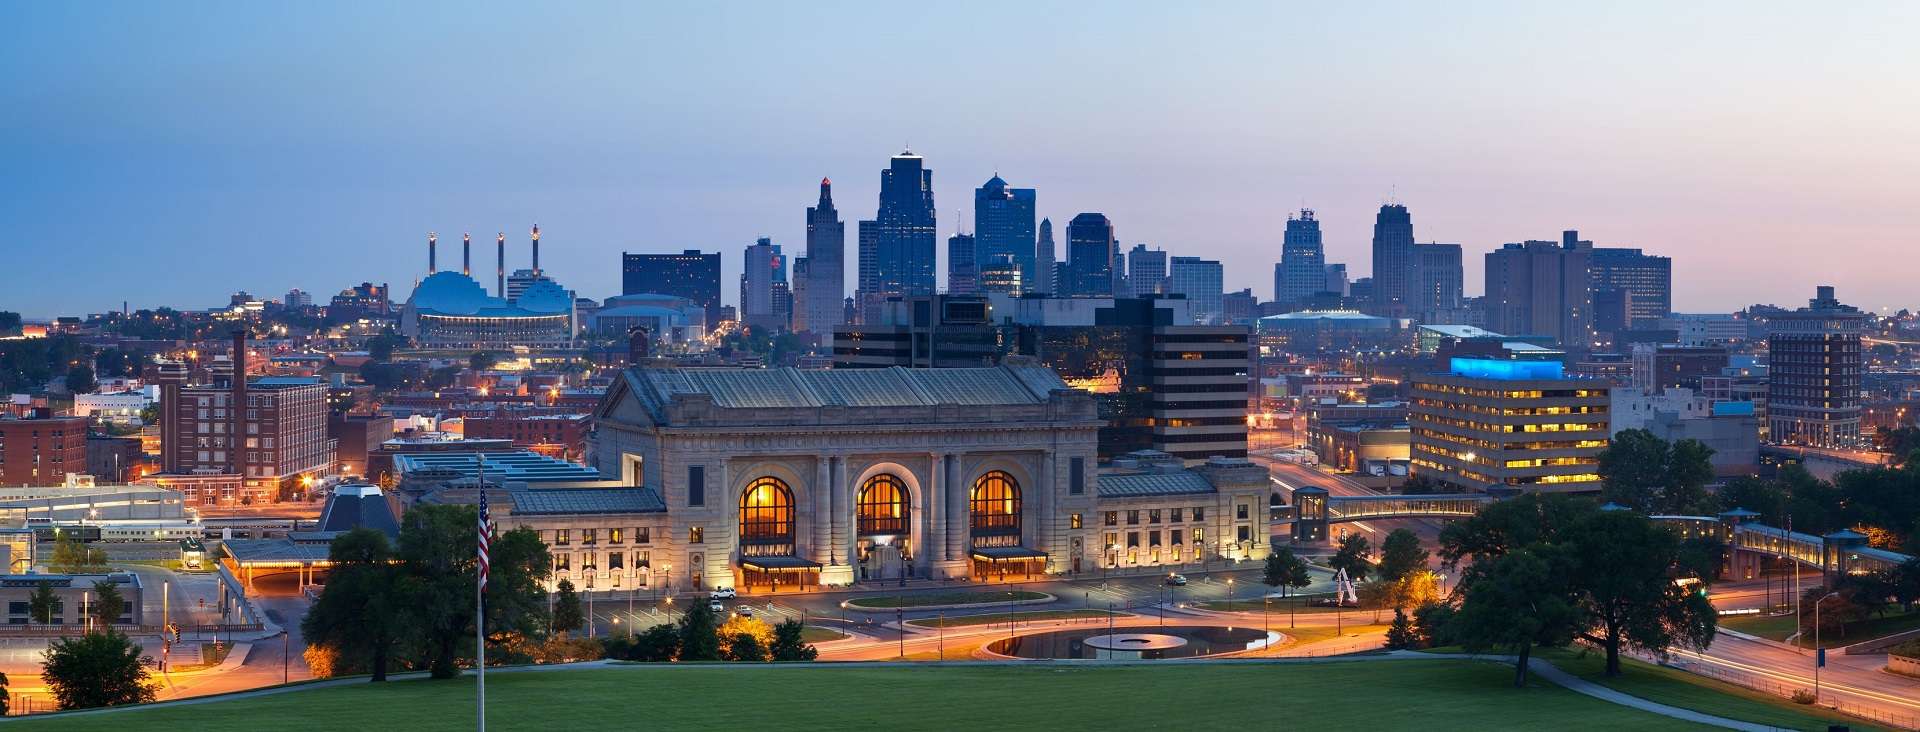 Kansas-City-Missouri-1.jpg